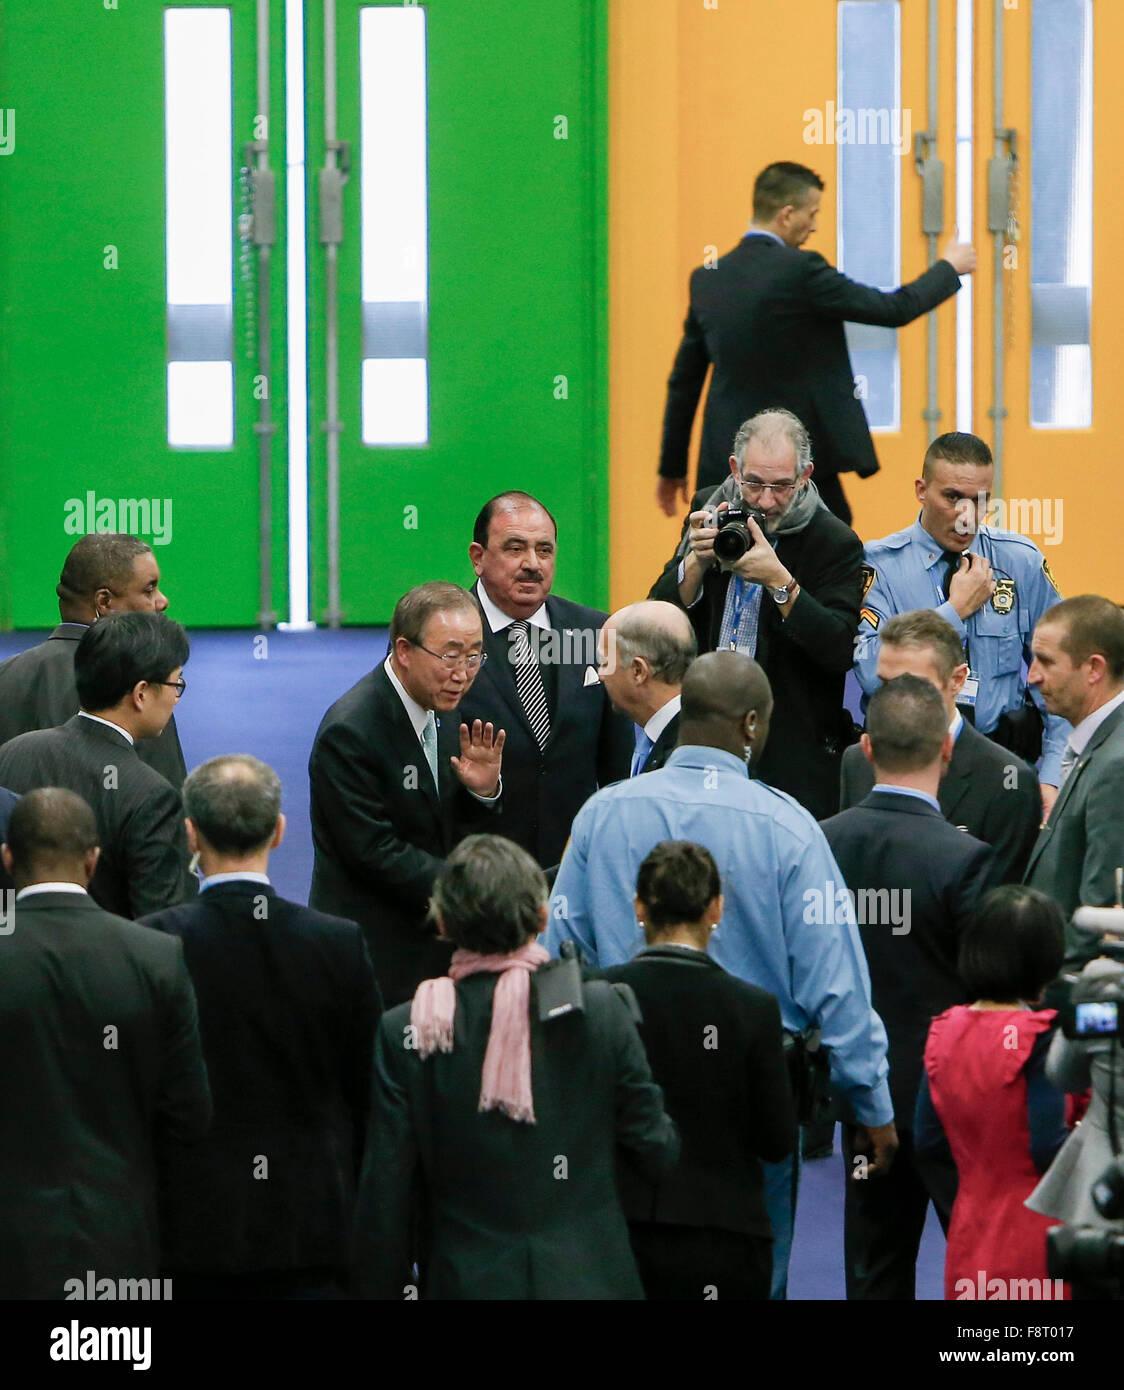 Paris, France. 11th December, 2015. UN Secretary-General Ban Ki-moon waves after making a statement during Paris - Stock Image